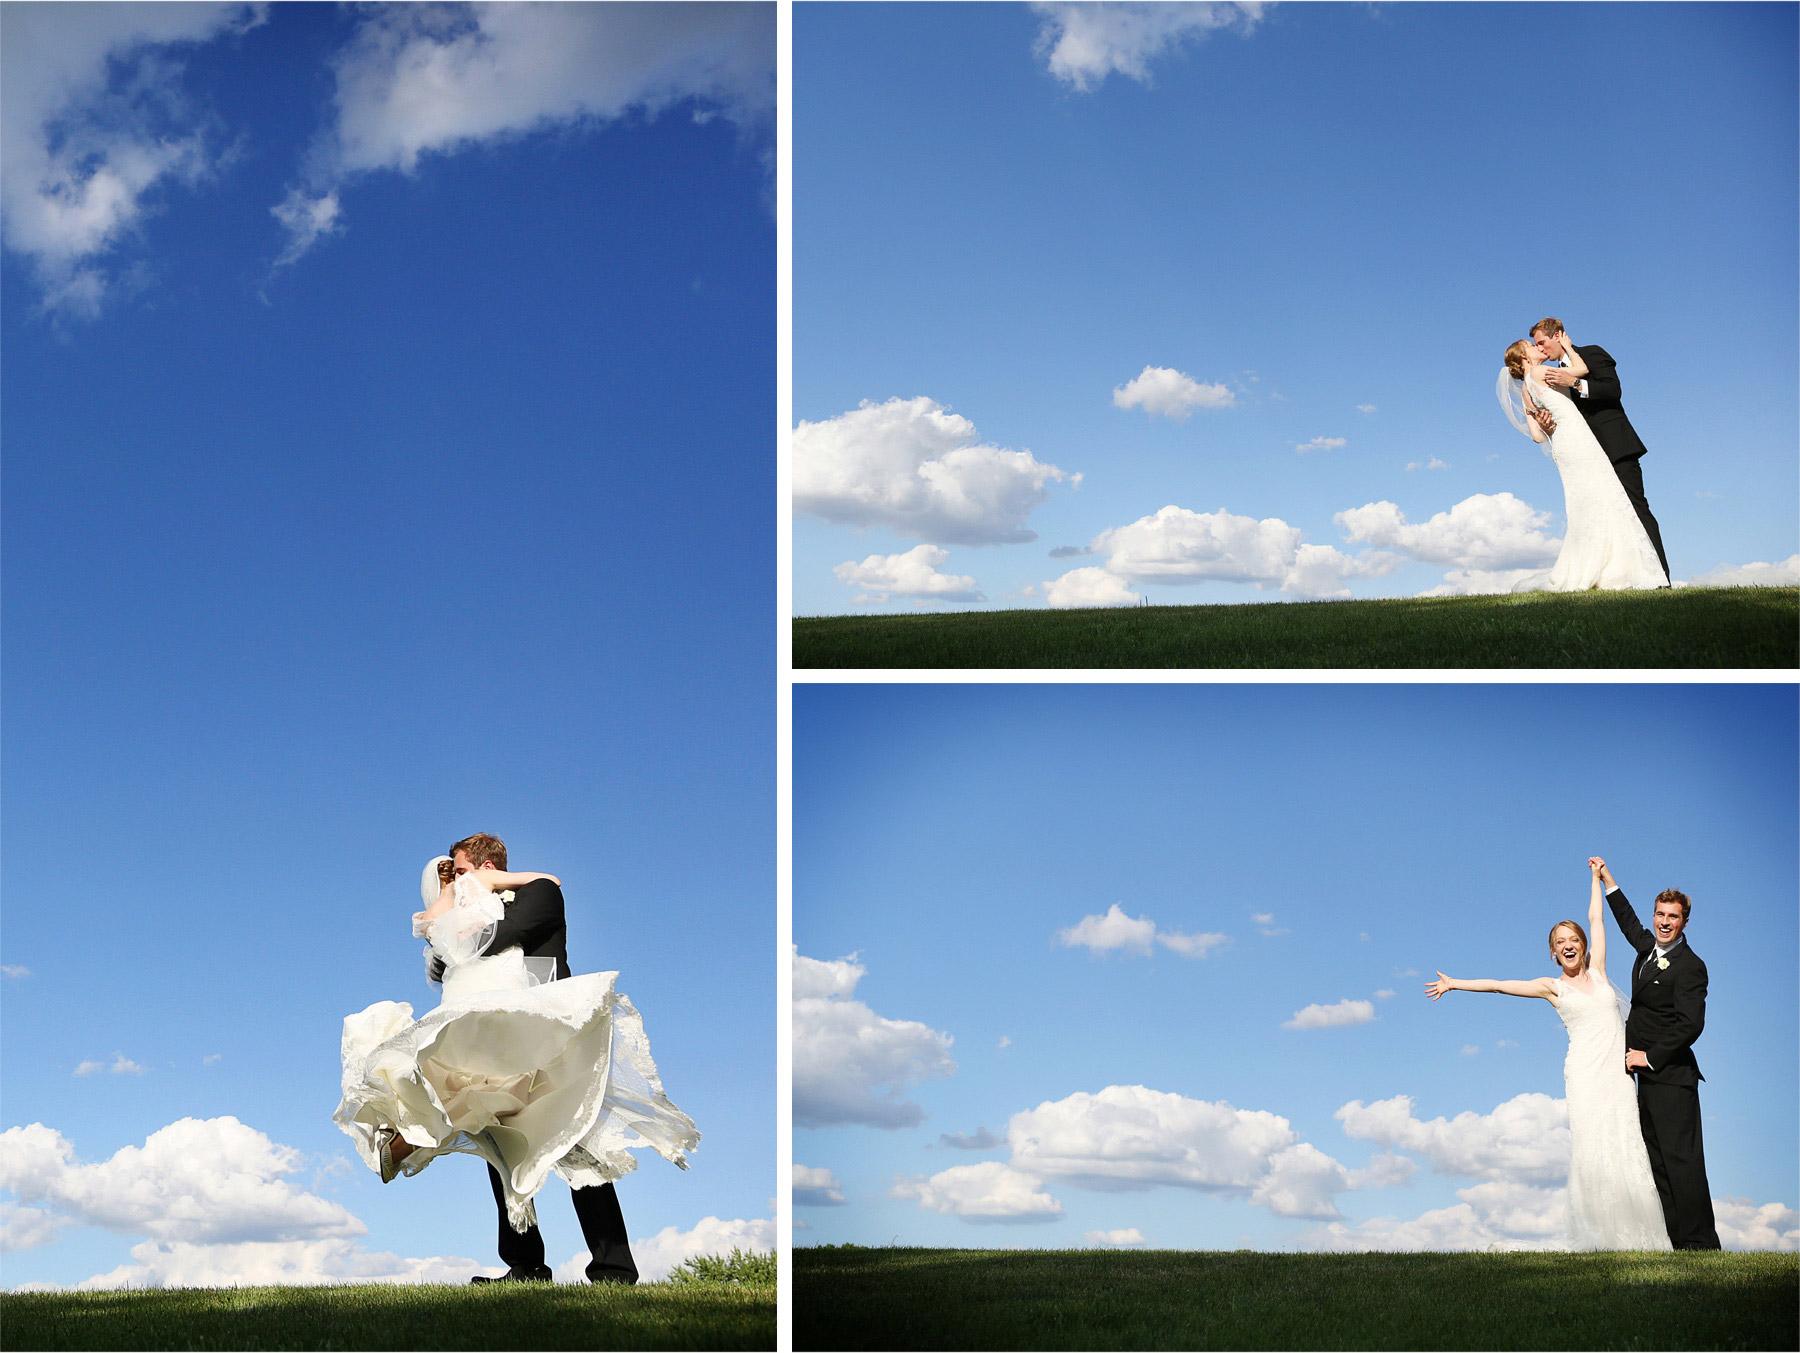 21-Edina-Minnesota-Wedding-Photographer-by-Andrew-Vick-Photography-Summer-Bride-Groom-Kiss-Twirl-Dress-Blue-Sky-Excitement-Vintage-Betsy-and-Jon.jpg